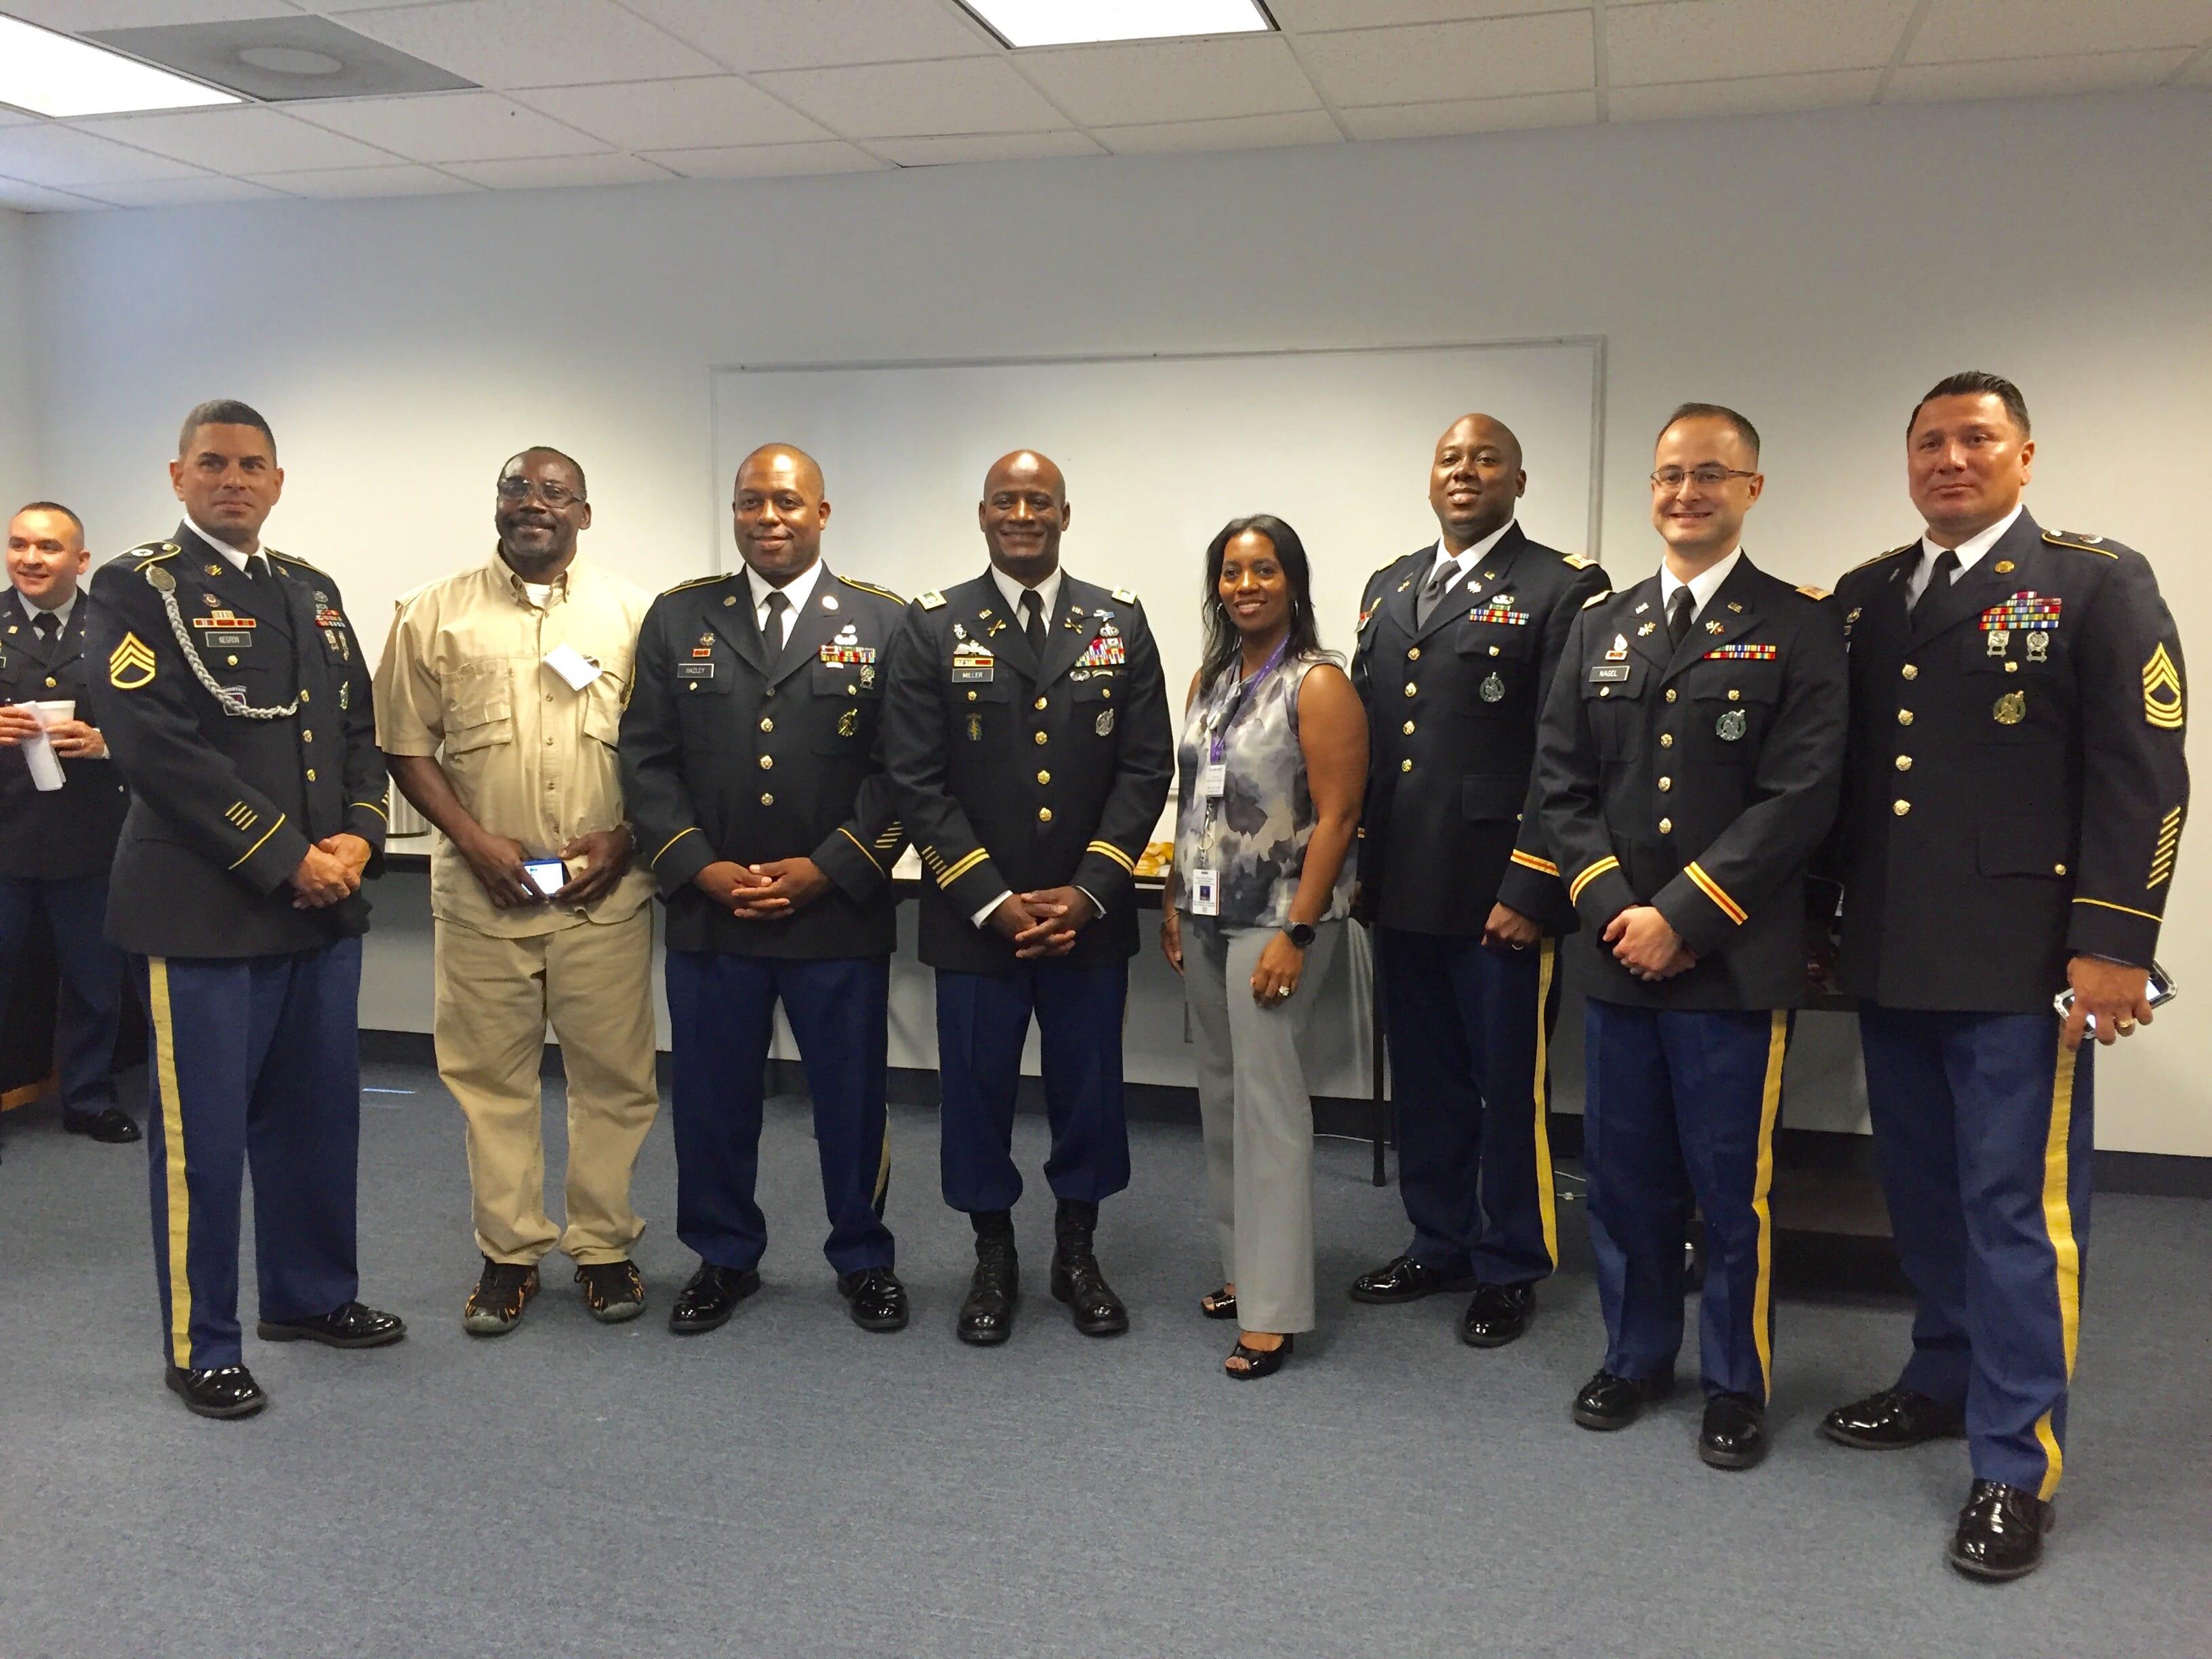 Ft. Lauderdale Hosts Broward County Educators